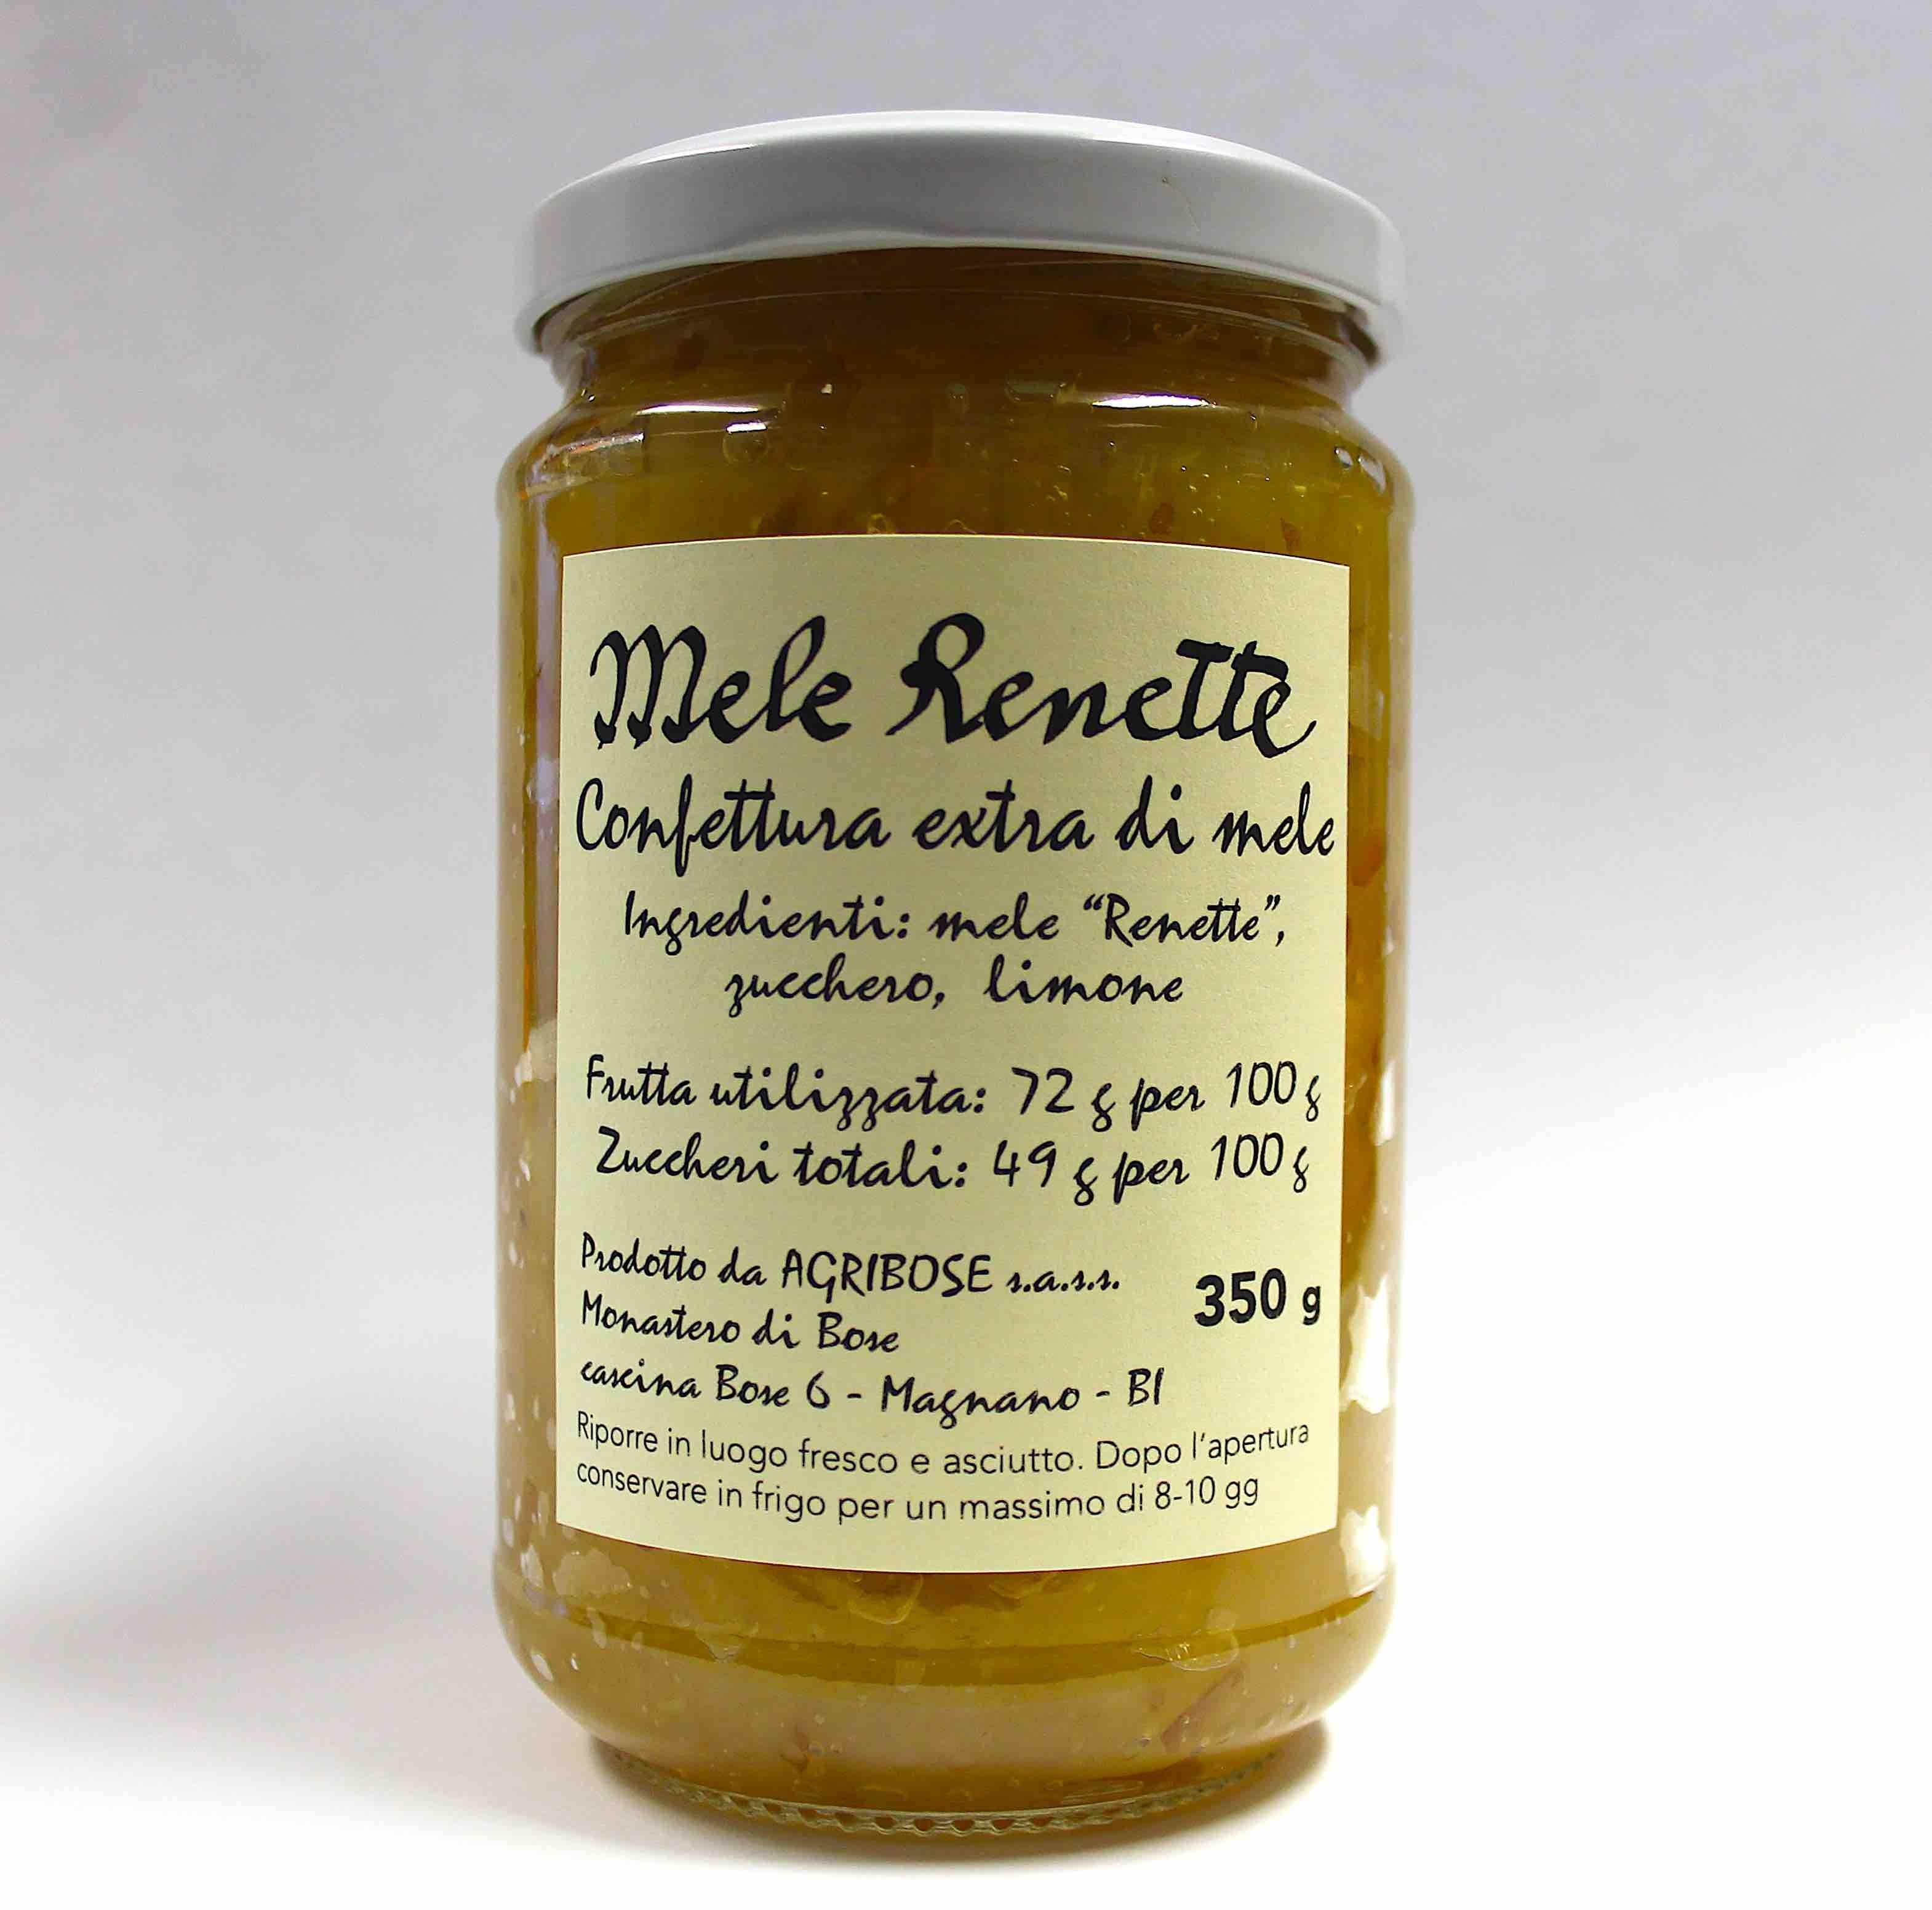 Mele Renette - Confettura extra di mele